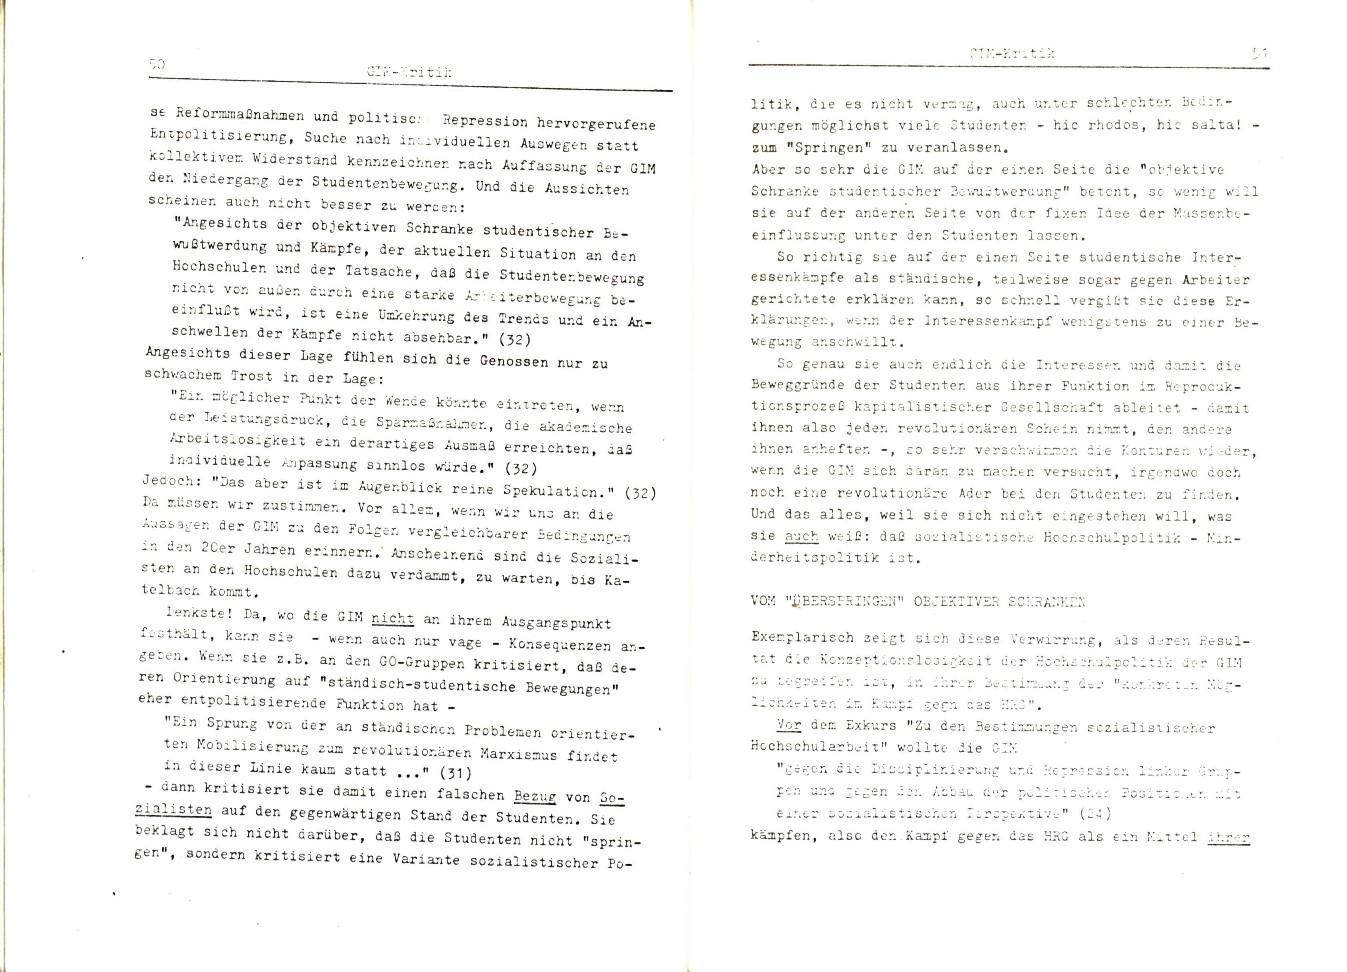 Muenster_SHO_1977_Studenteninteressen_26